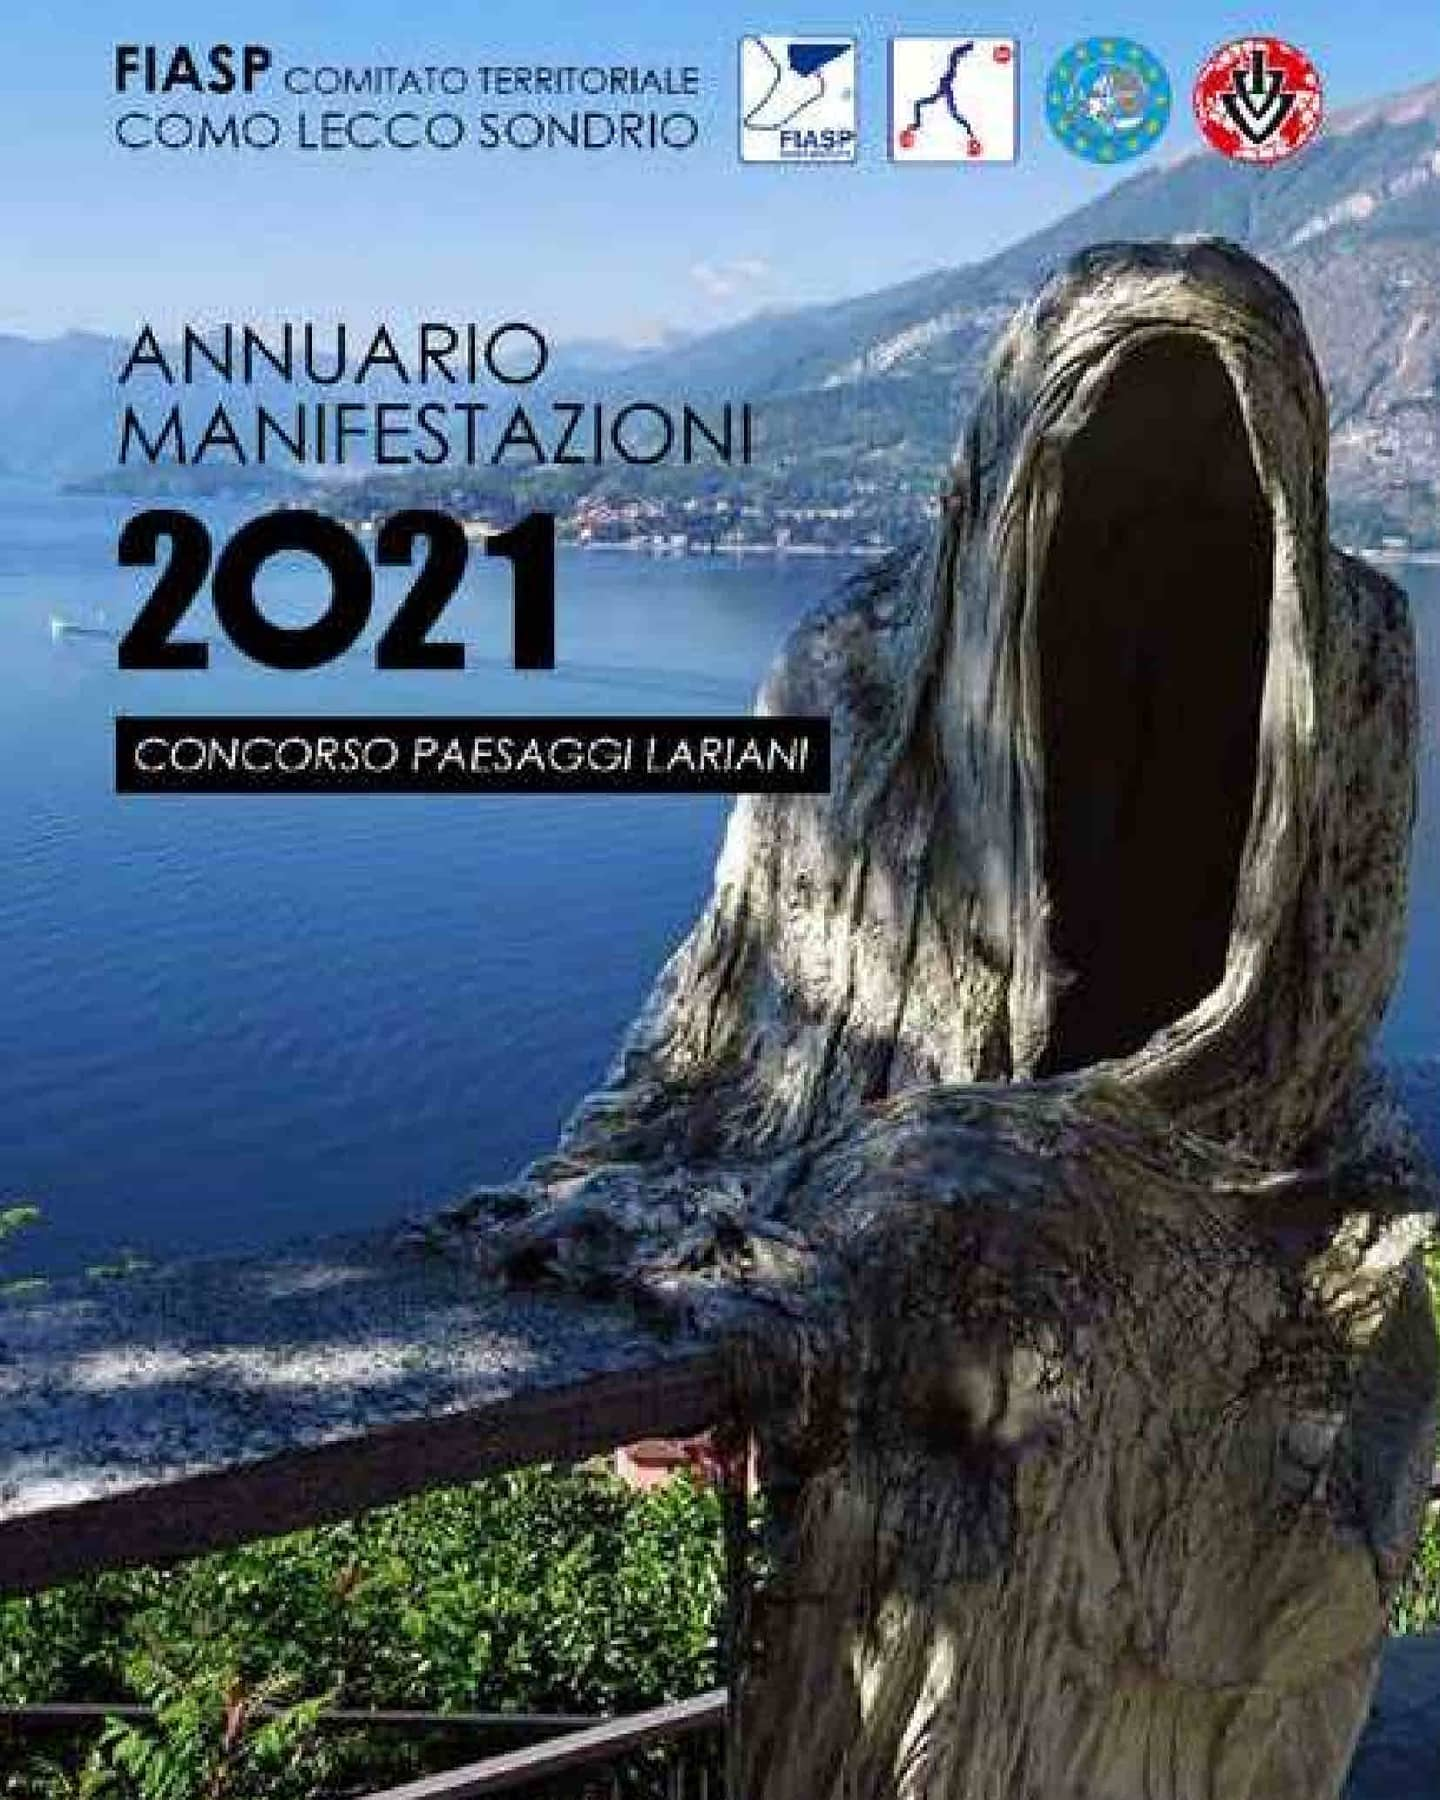 Calendario Fiasp Lodi 2021 Fiasp Italia   Comitati   C.T. Como/Lecco/Sondrio   CALENDARIO